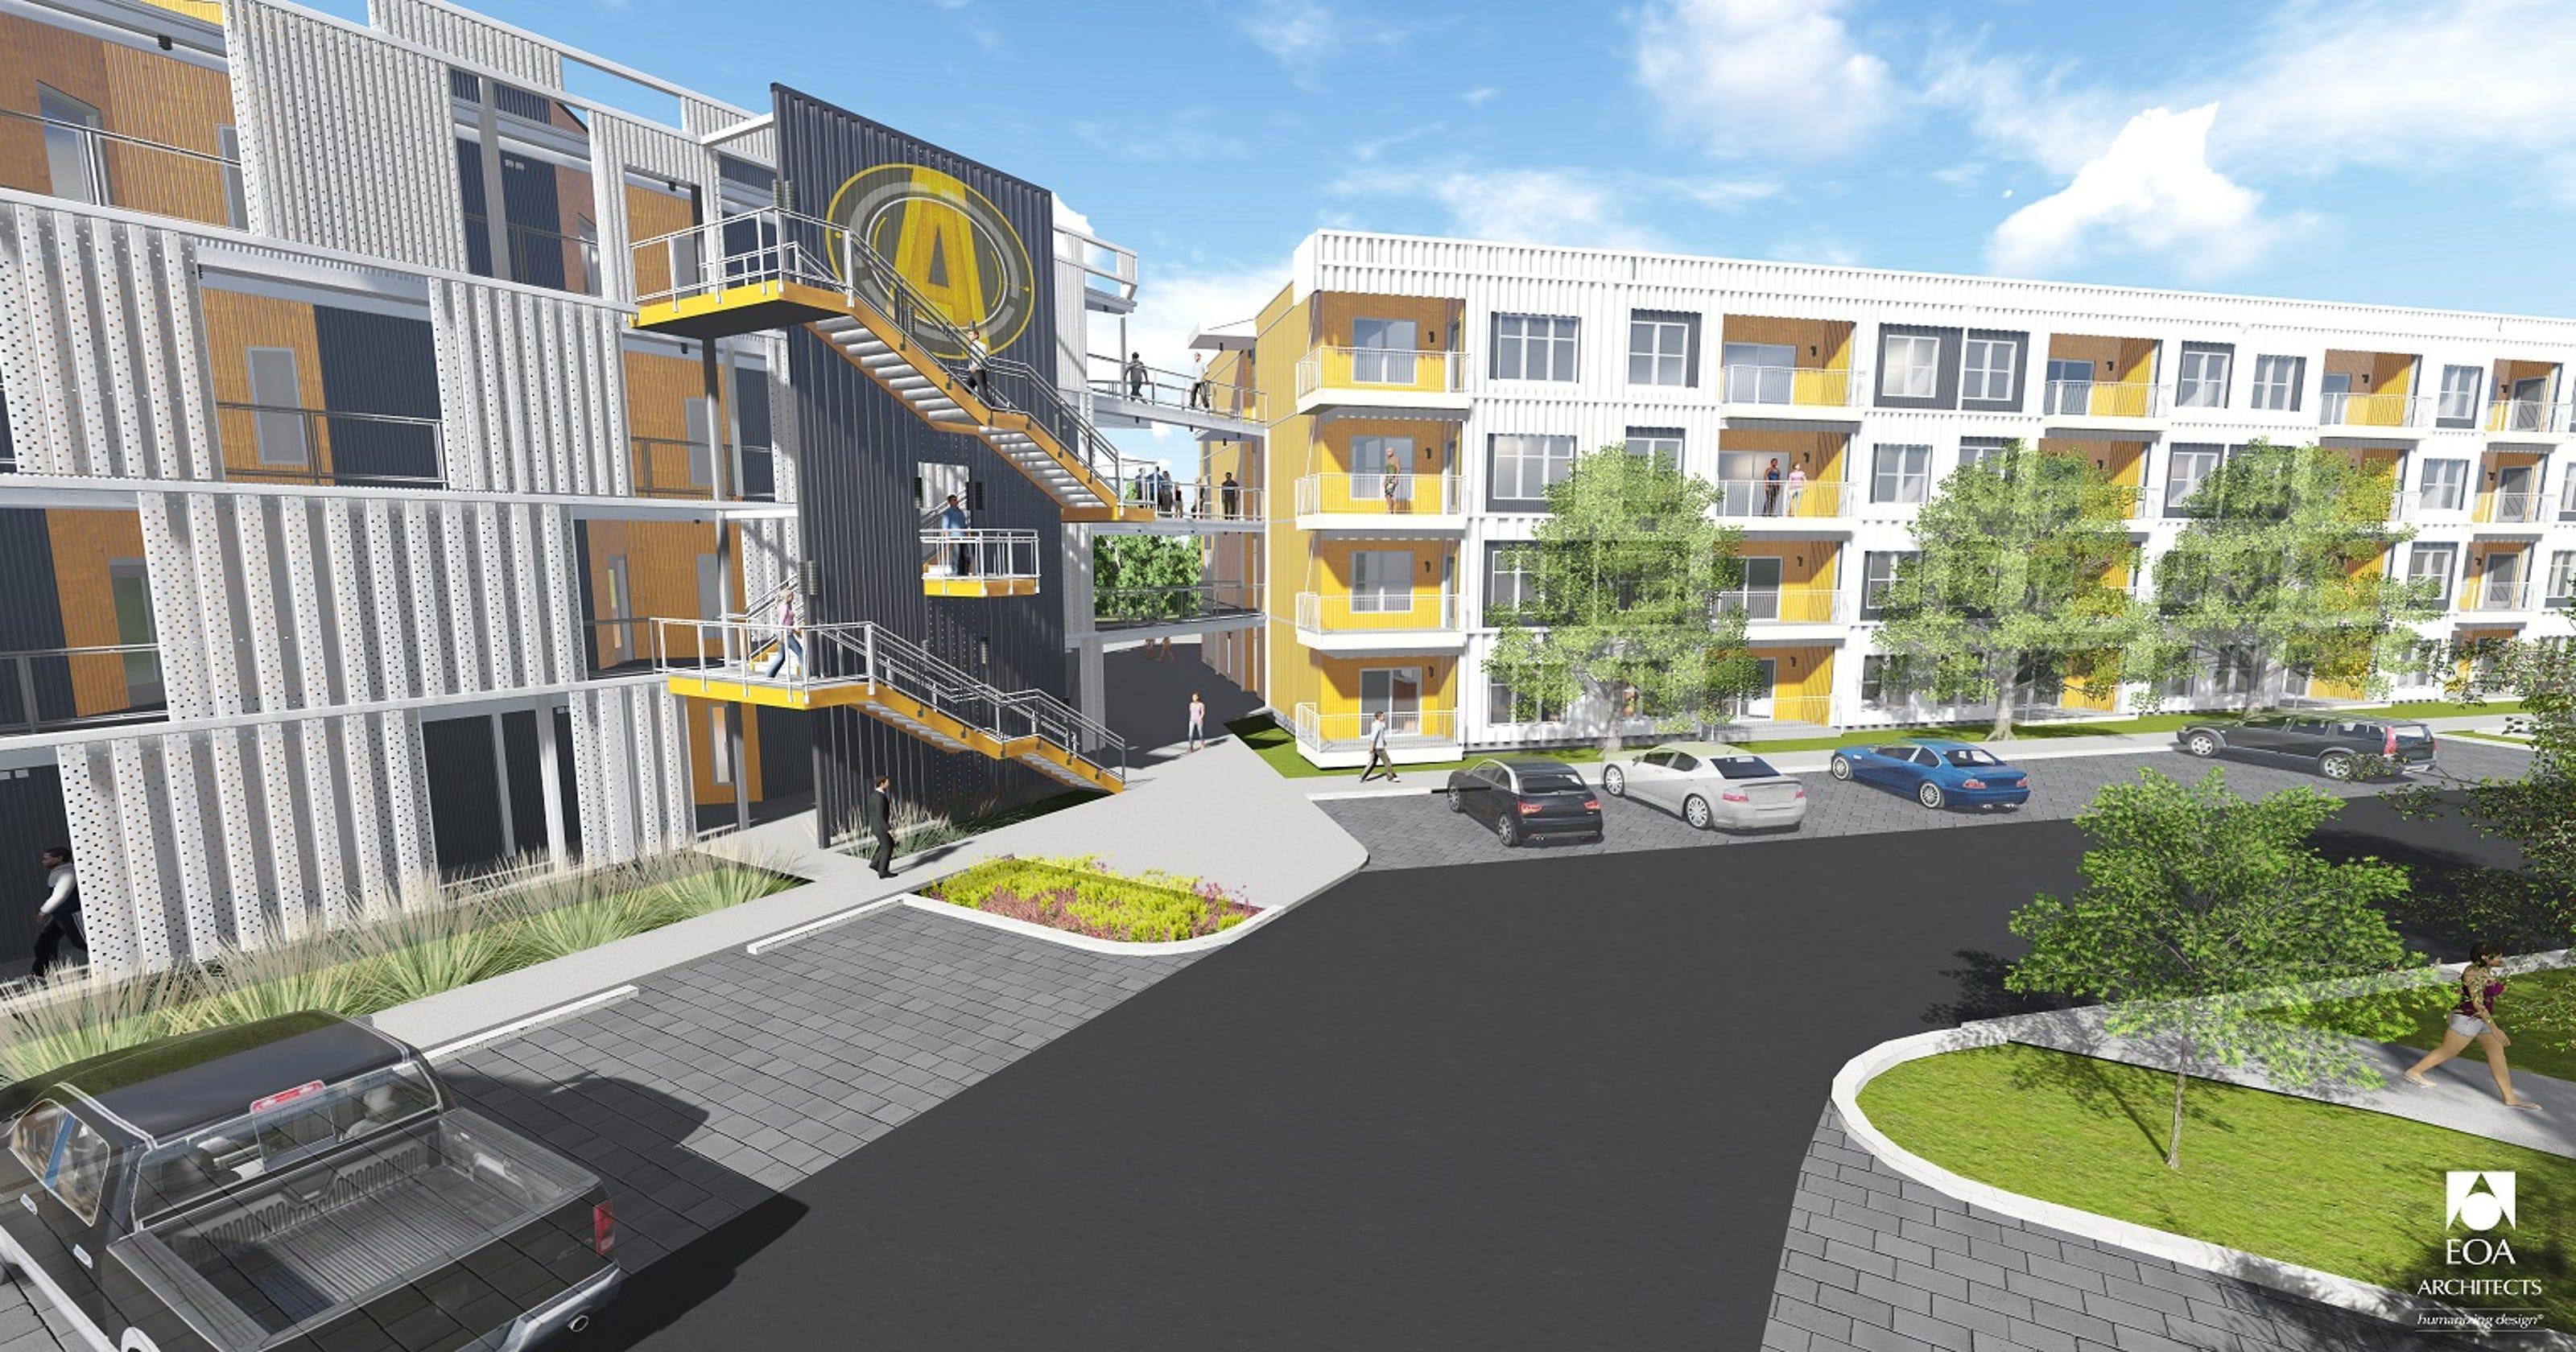 180 new condos, retail space planned near Fairgrounds Nashville